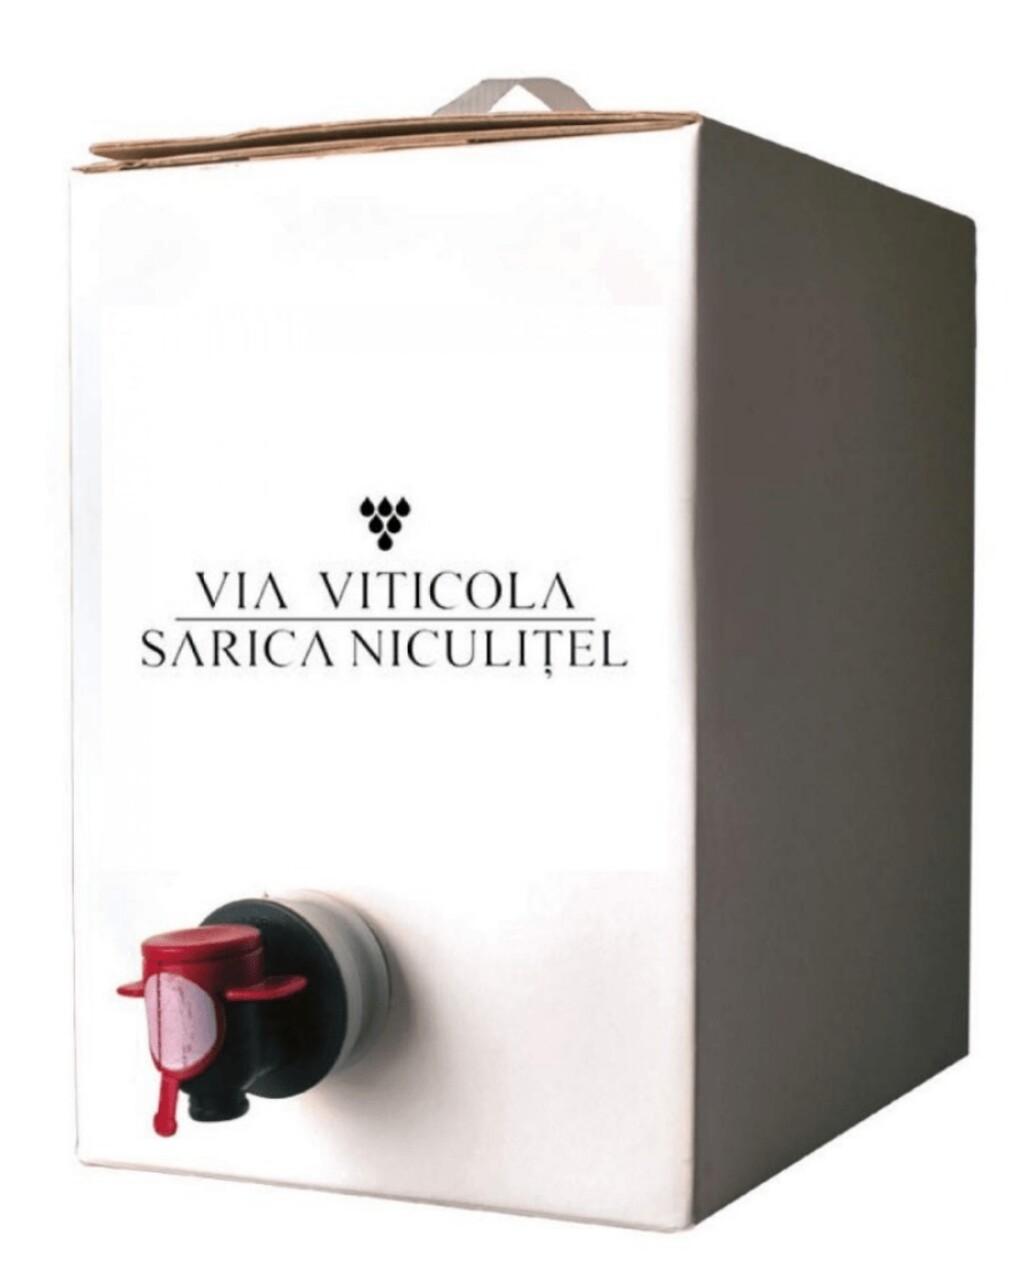 Sarica Niculitel Aligole Fume Blanc BIB 3L